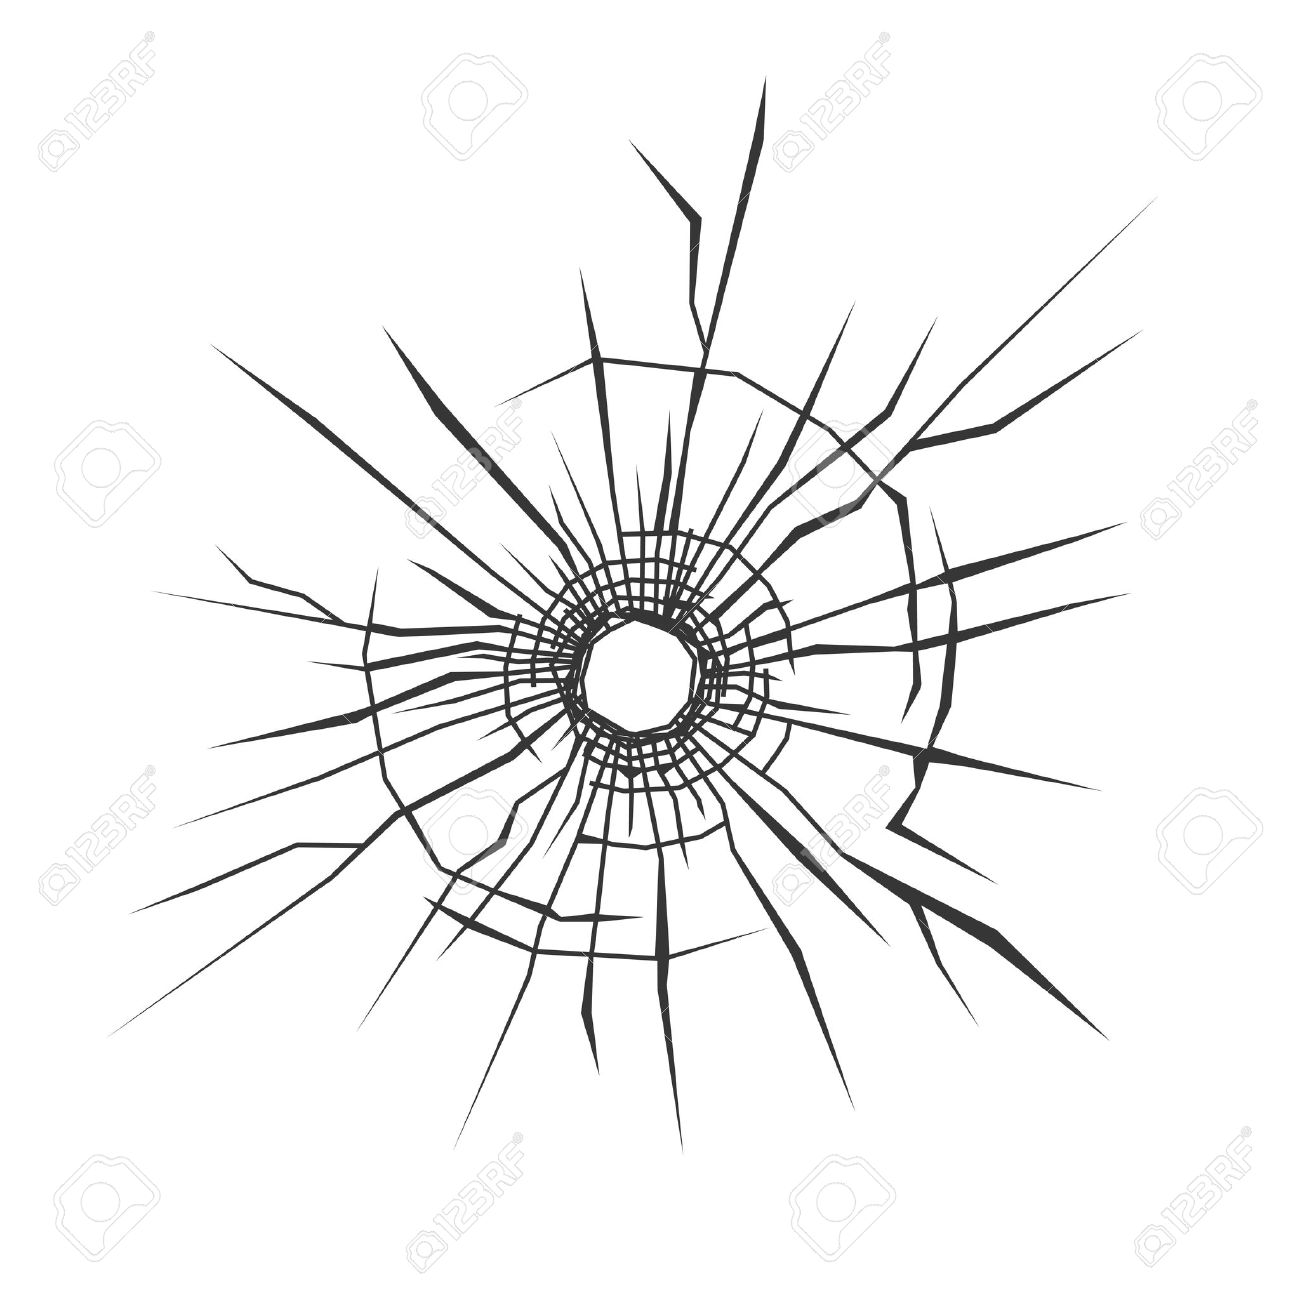 1300x1300 Drawn Bullet Bullet Hole